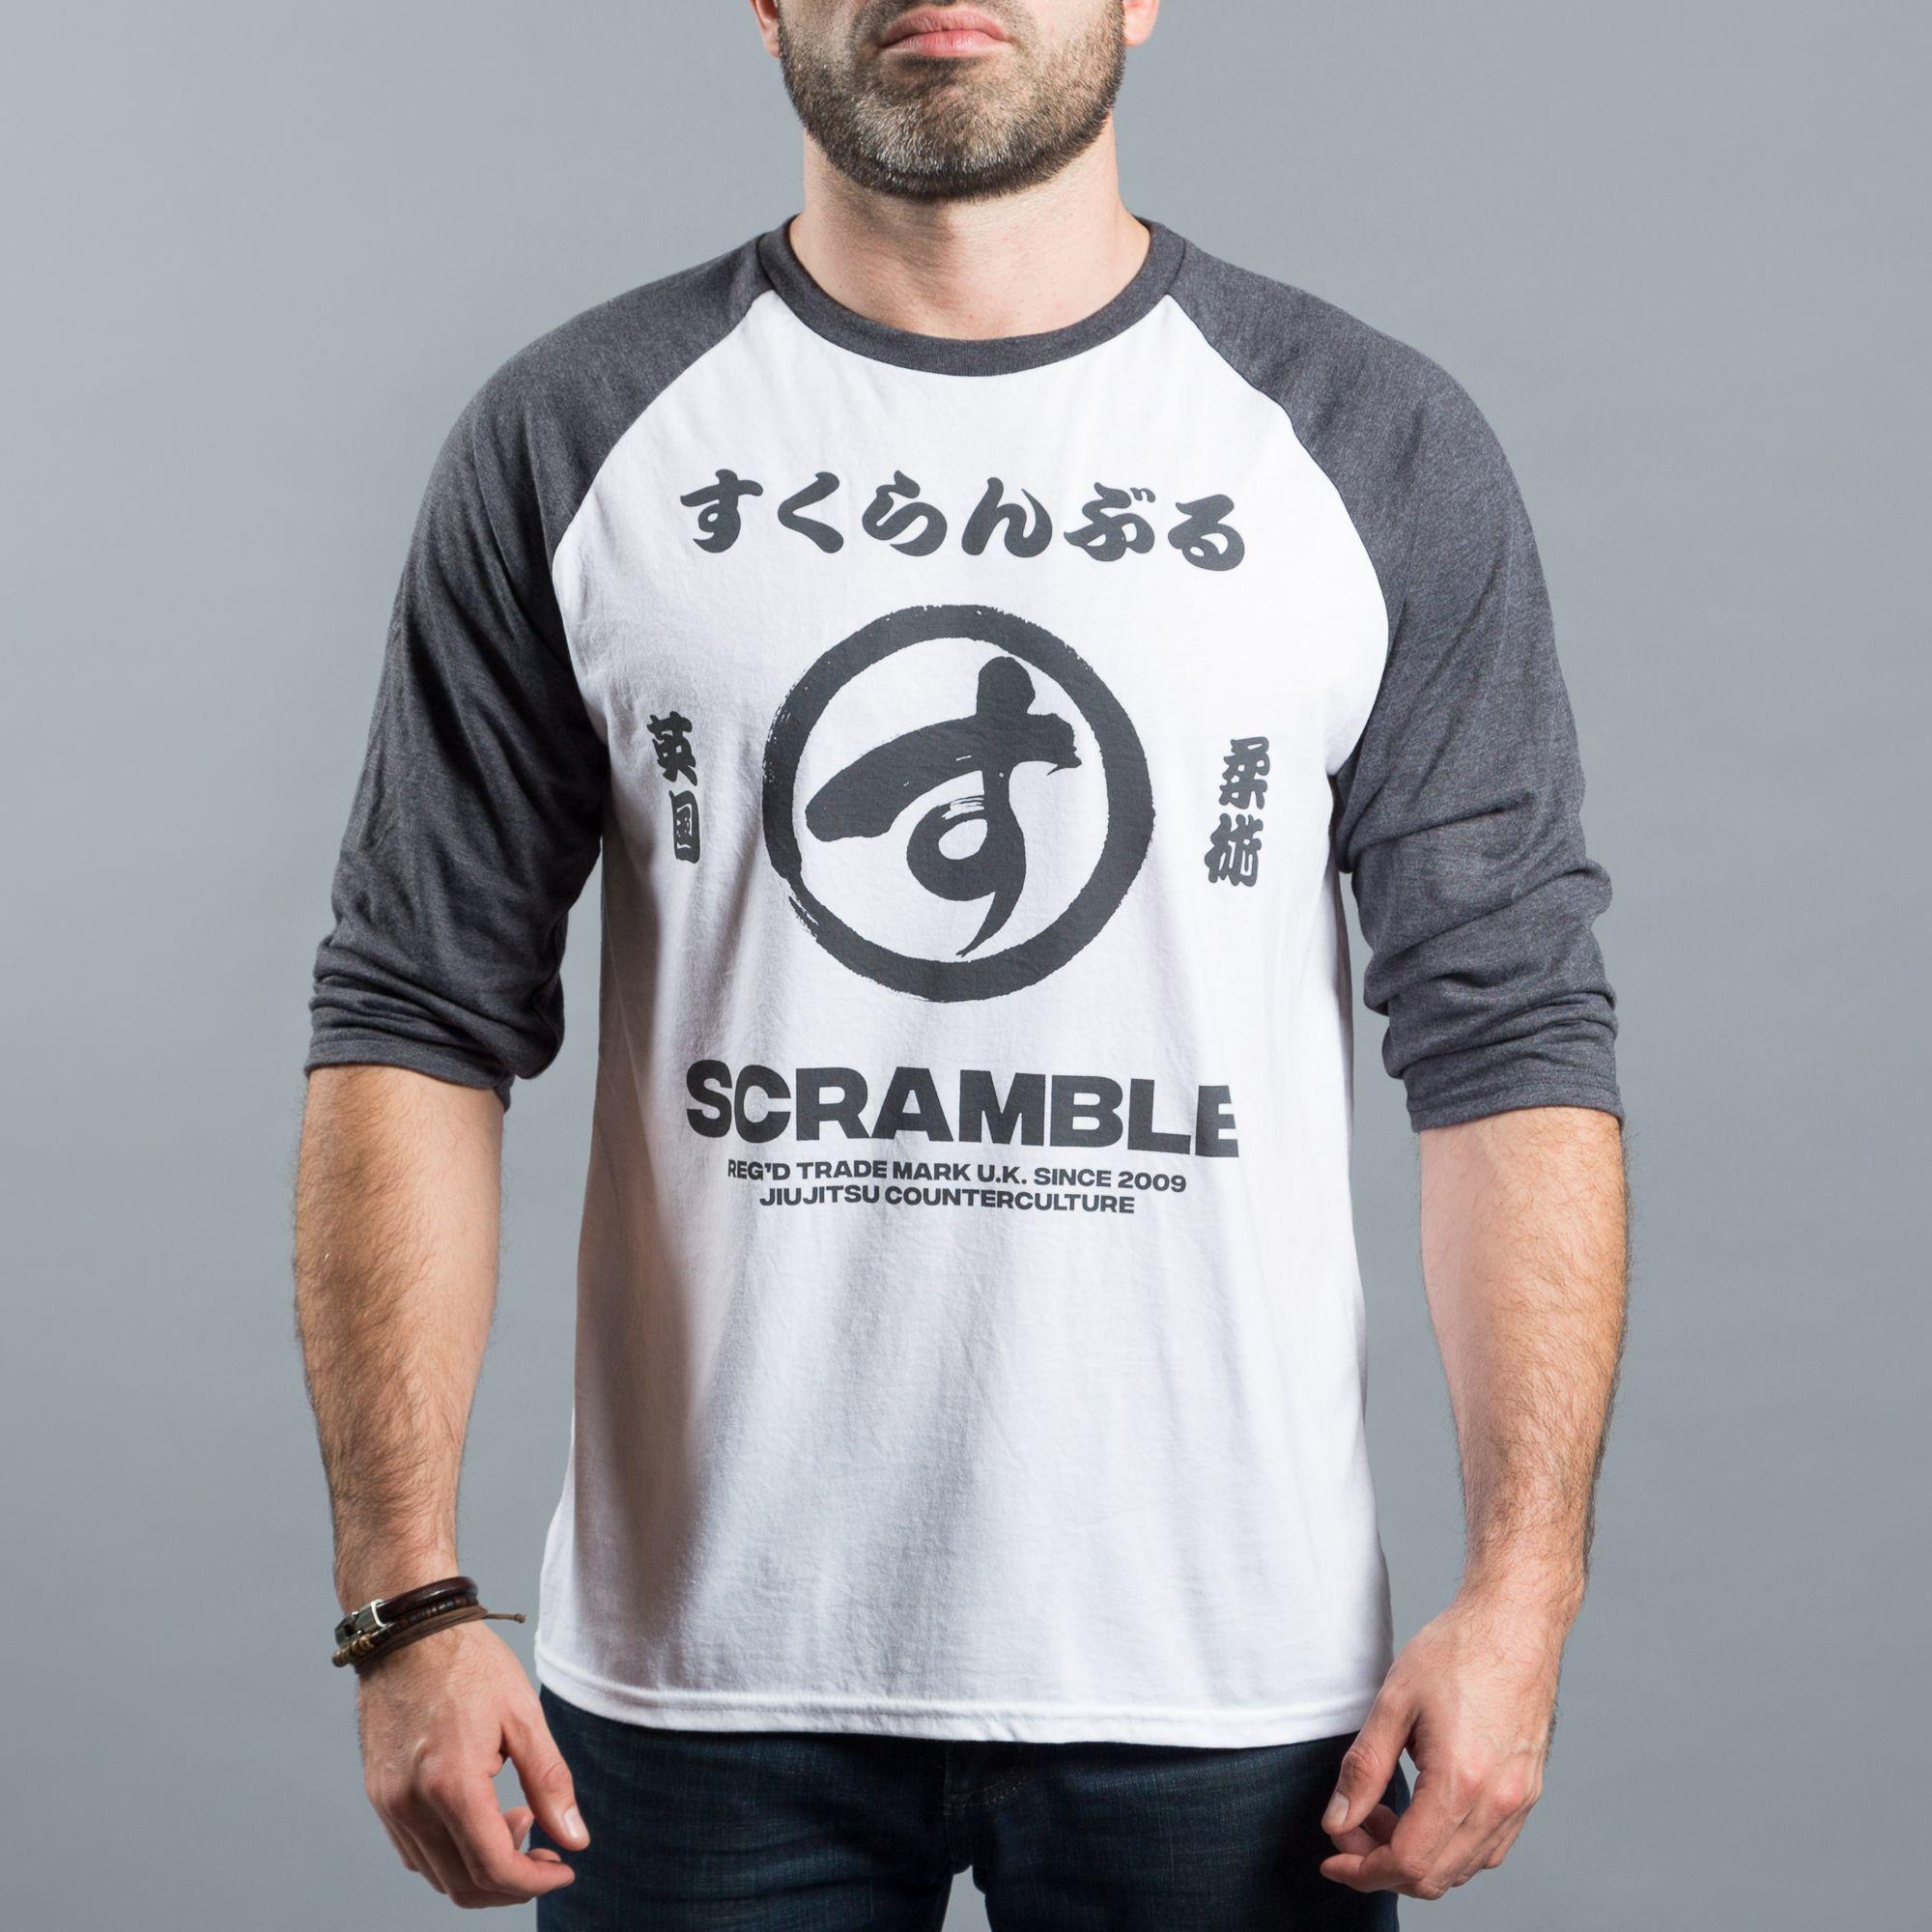 SCRAMBLE スクランブル BRUSH LOGO RAGLAN TEE|格闘技、柔術Tシャツ